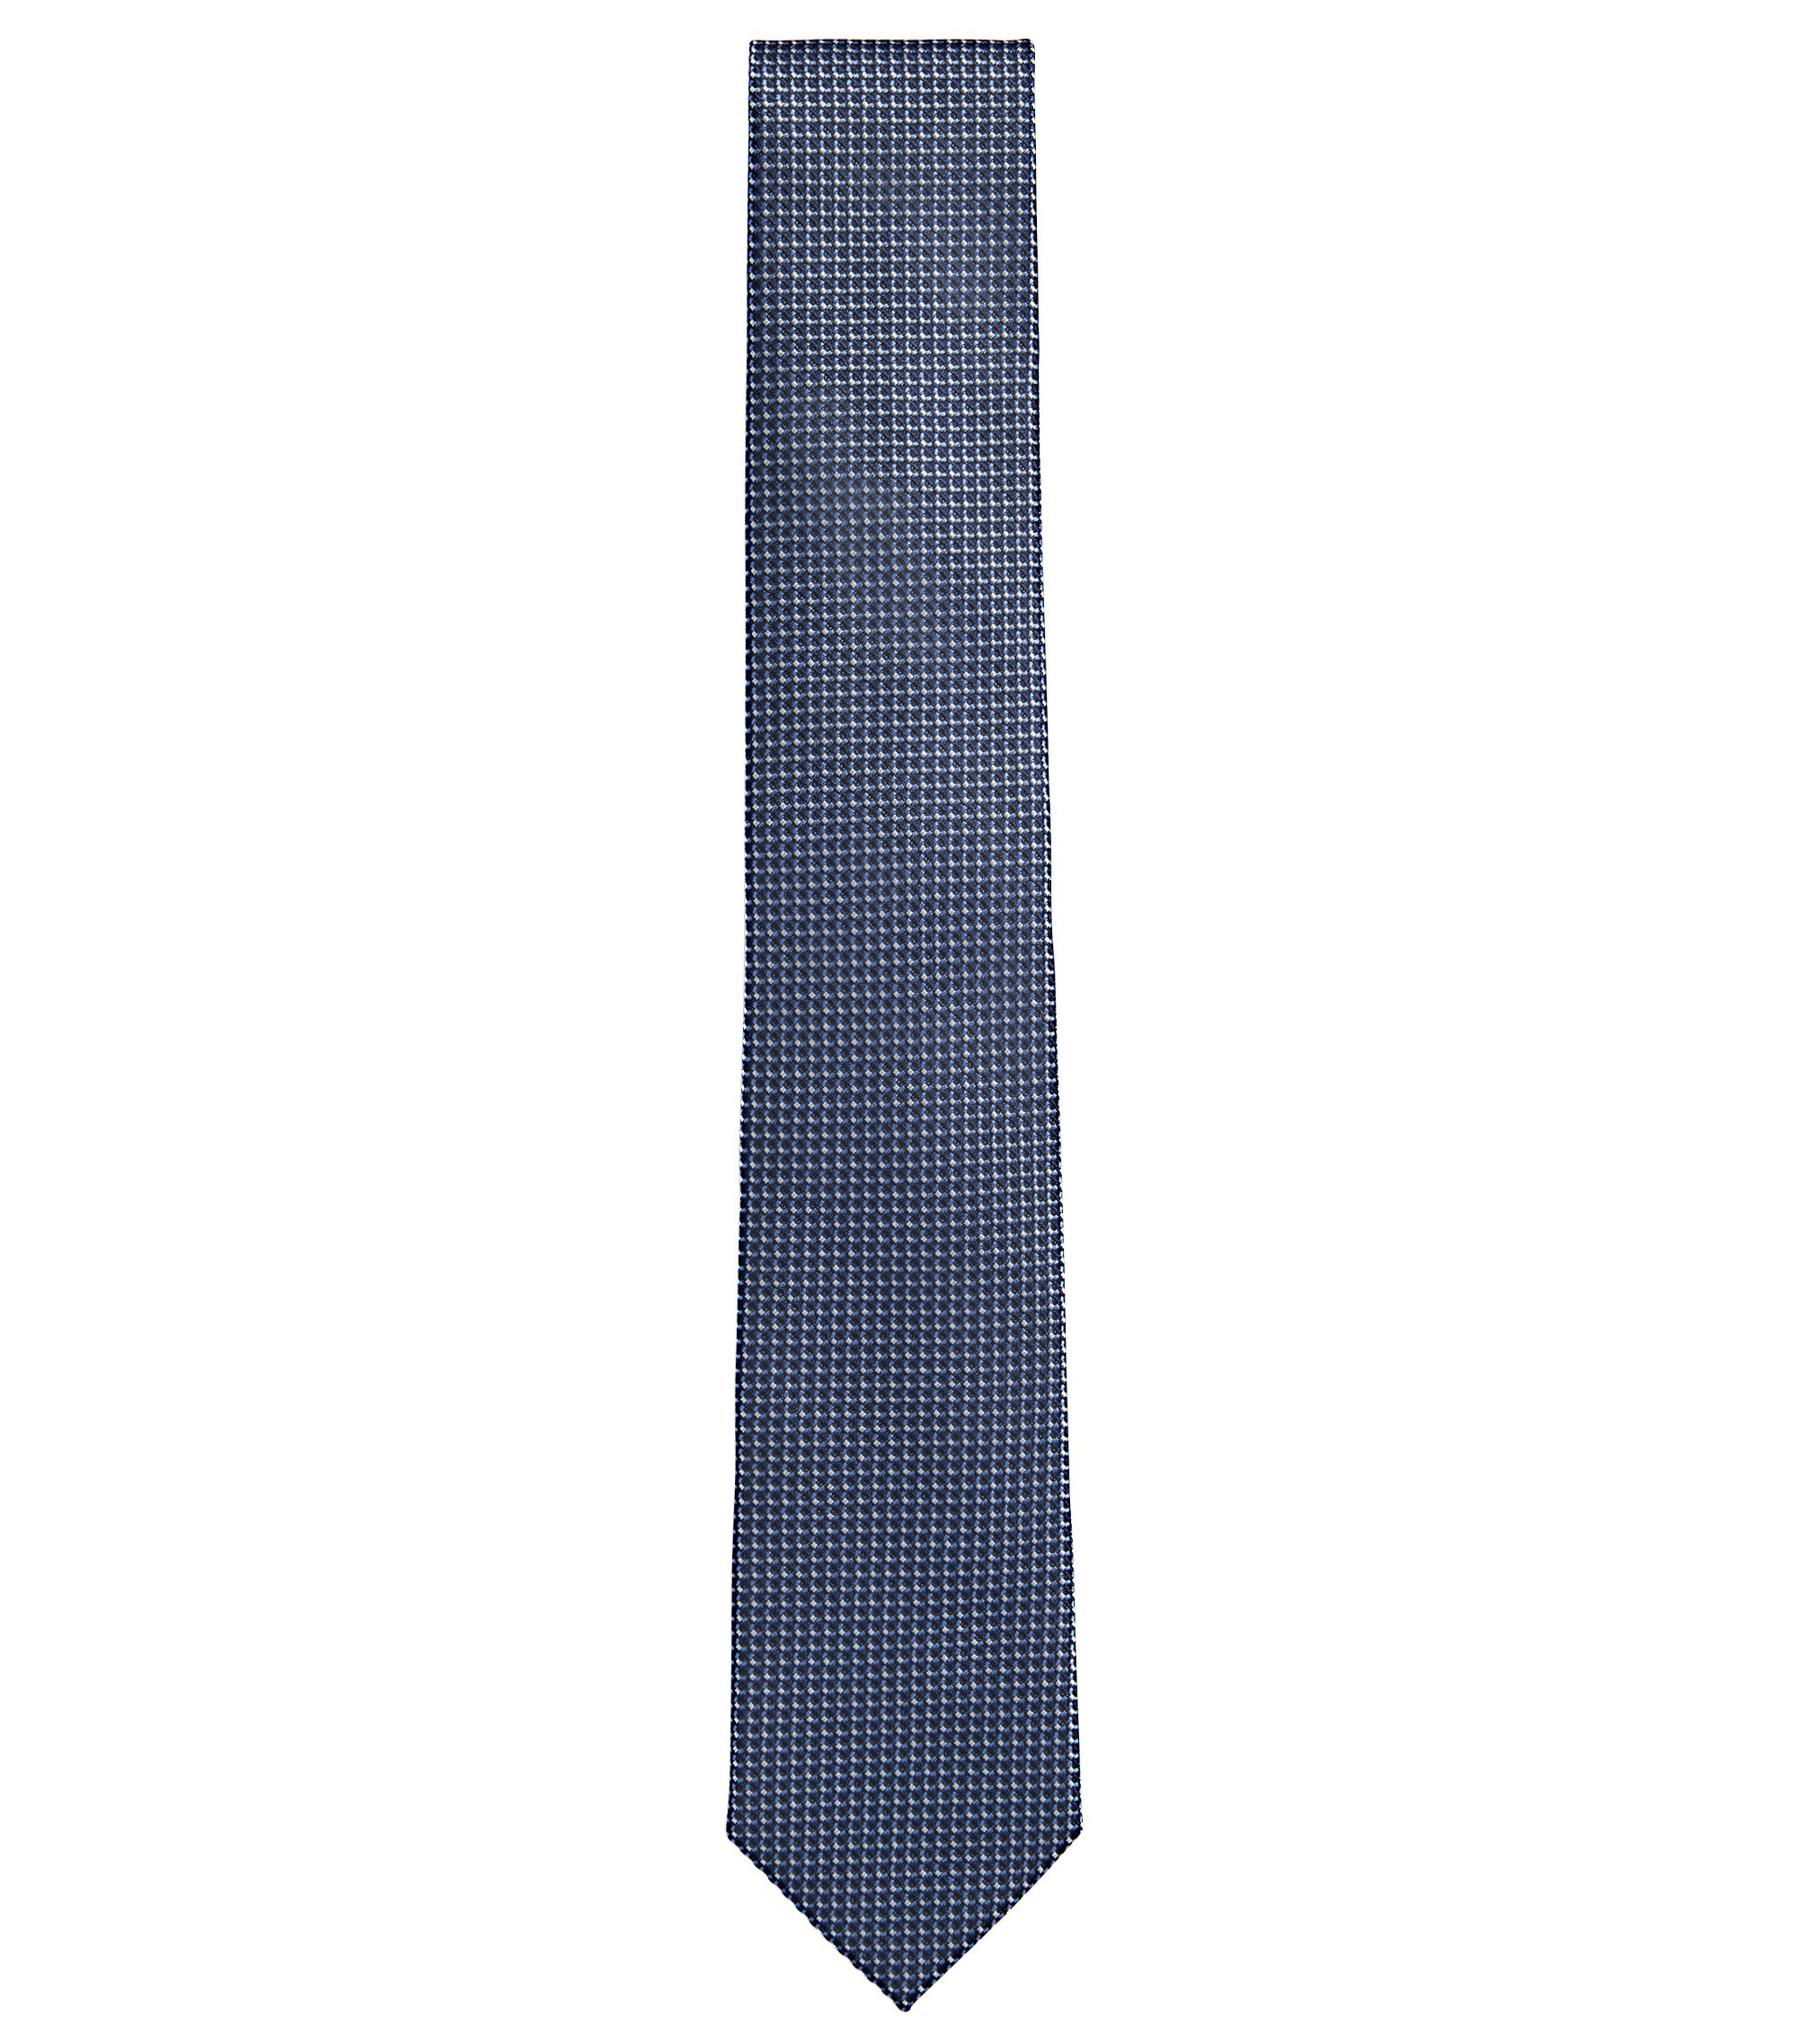 Patterned Italian Silk Tie, Dark Blue